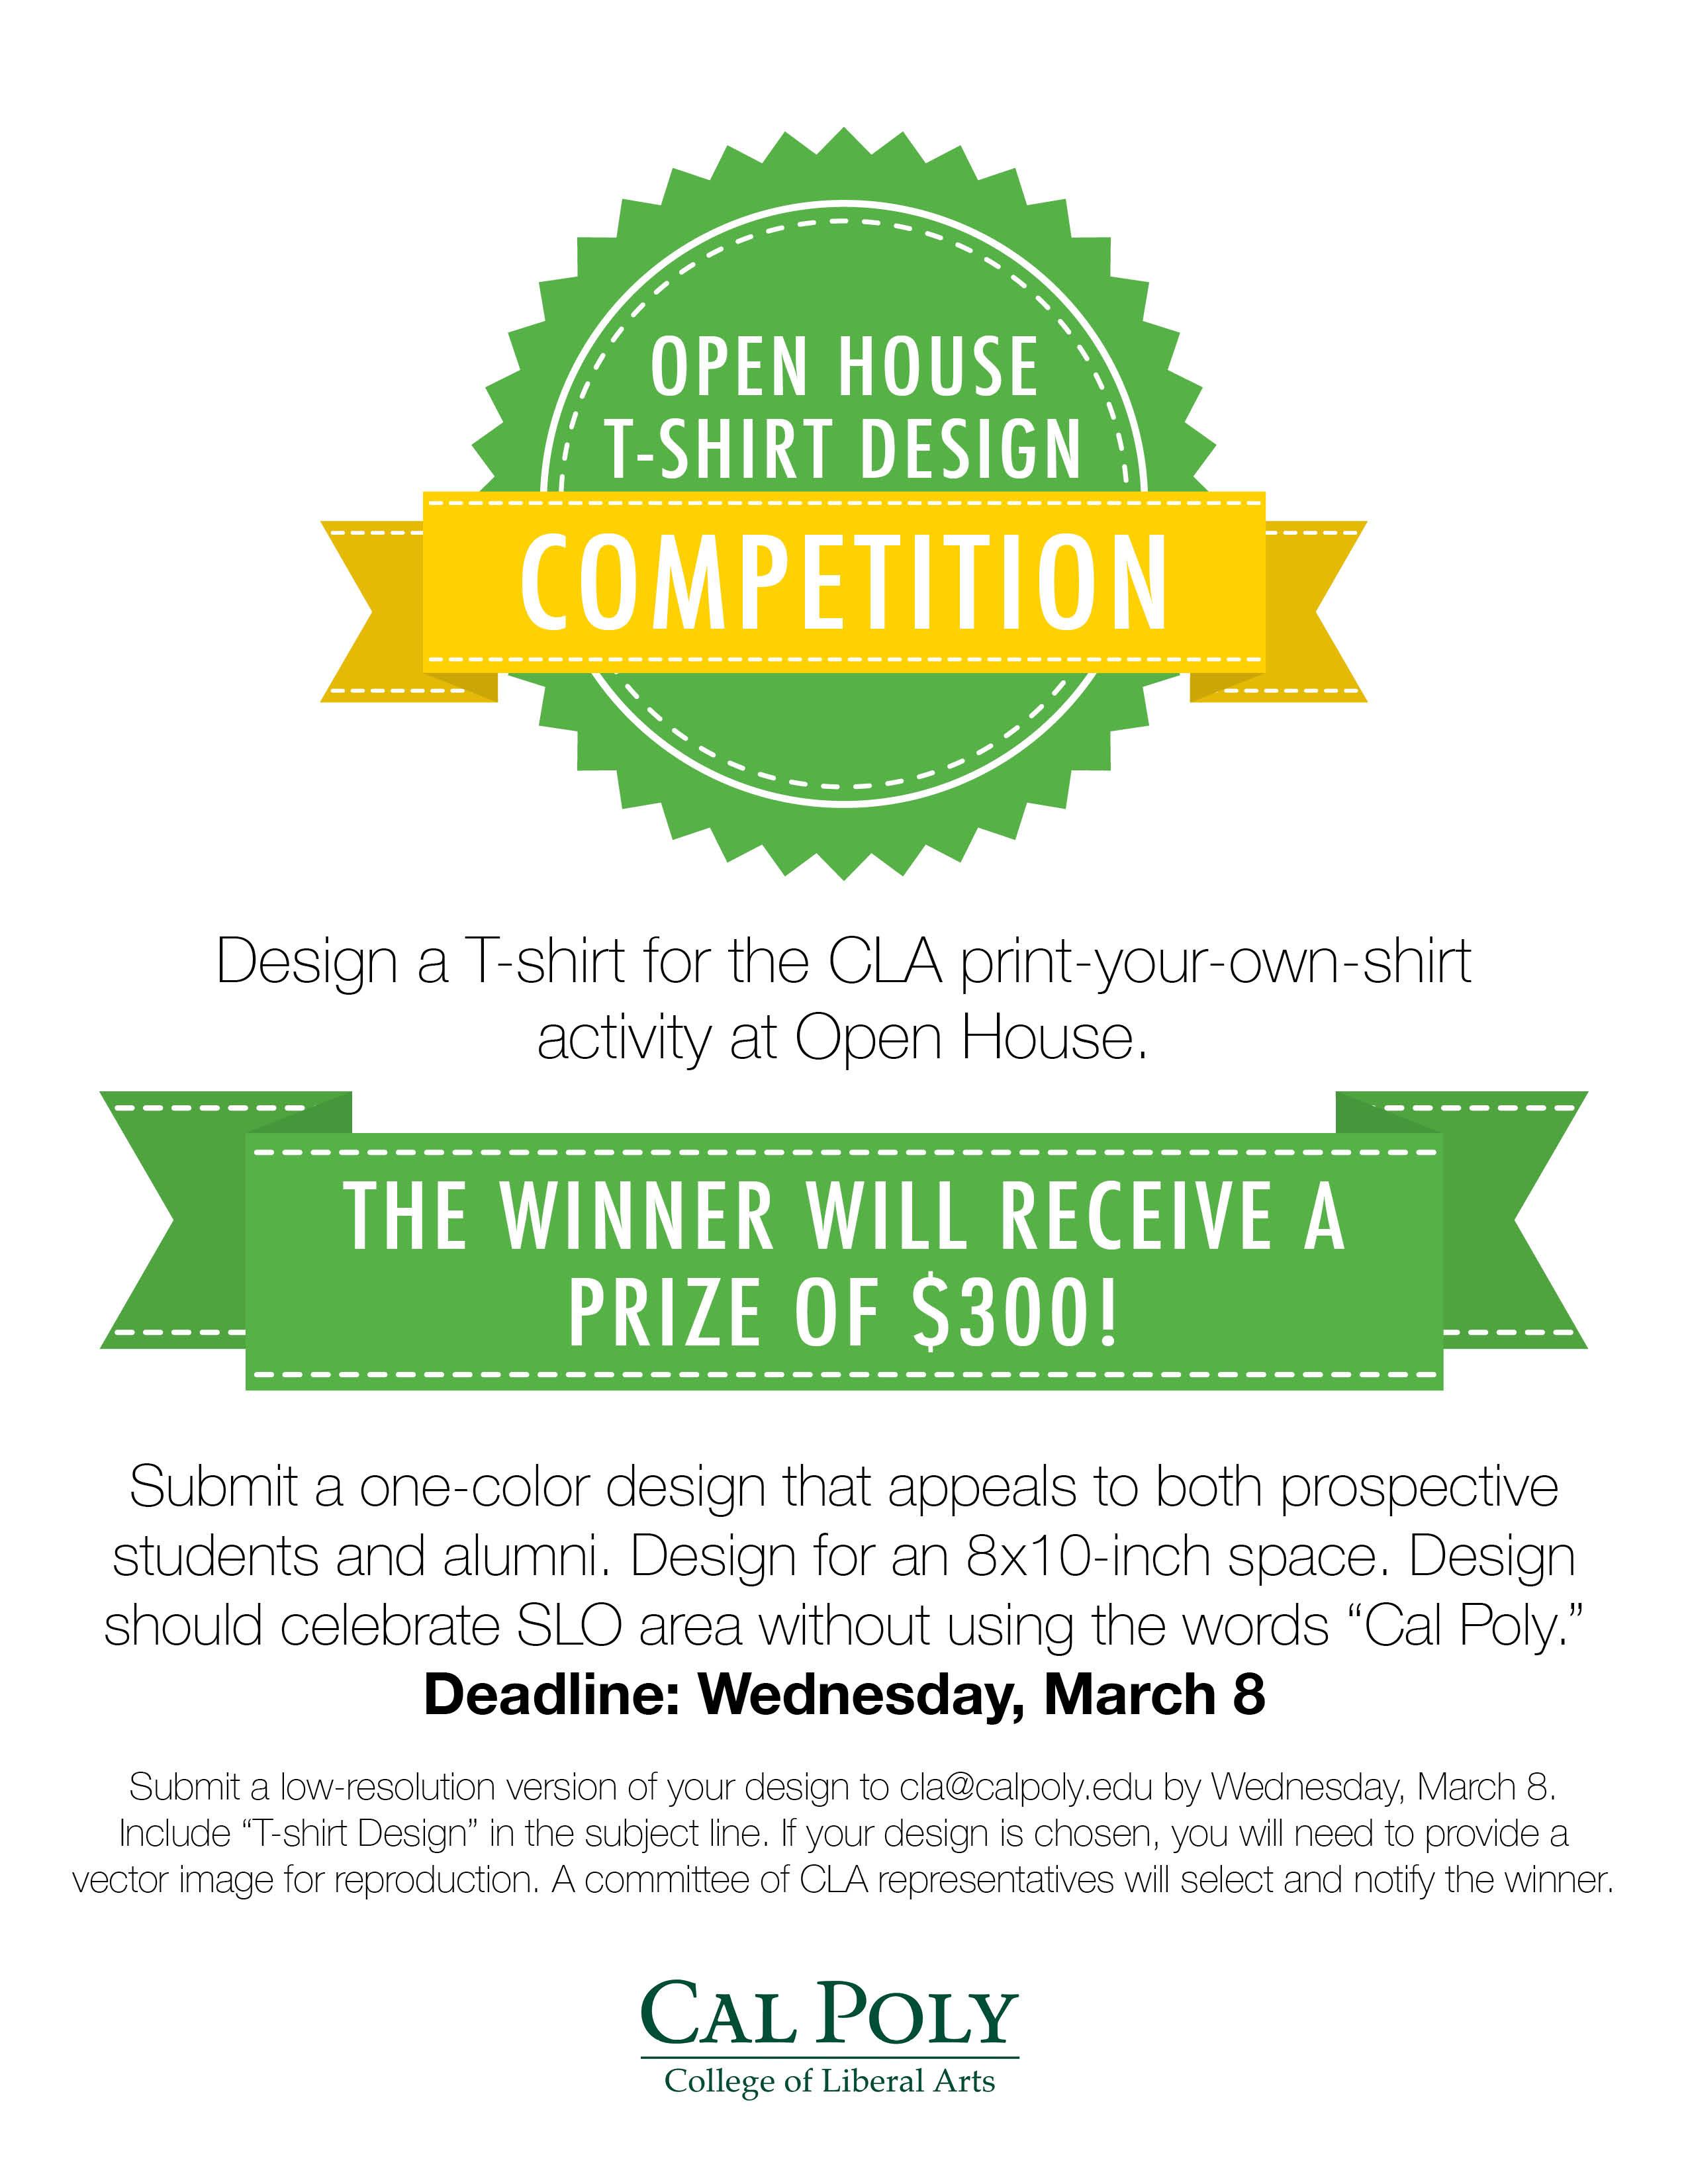 Shirt design resolution - Open House T Shirt Design Competition